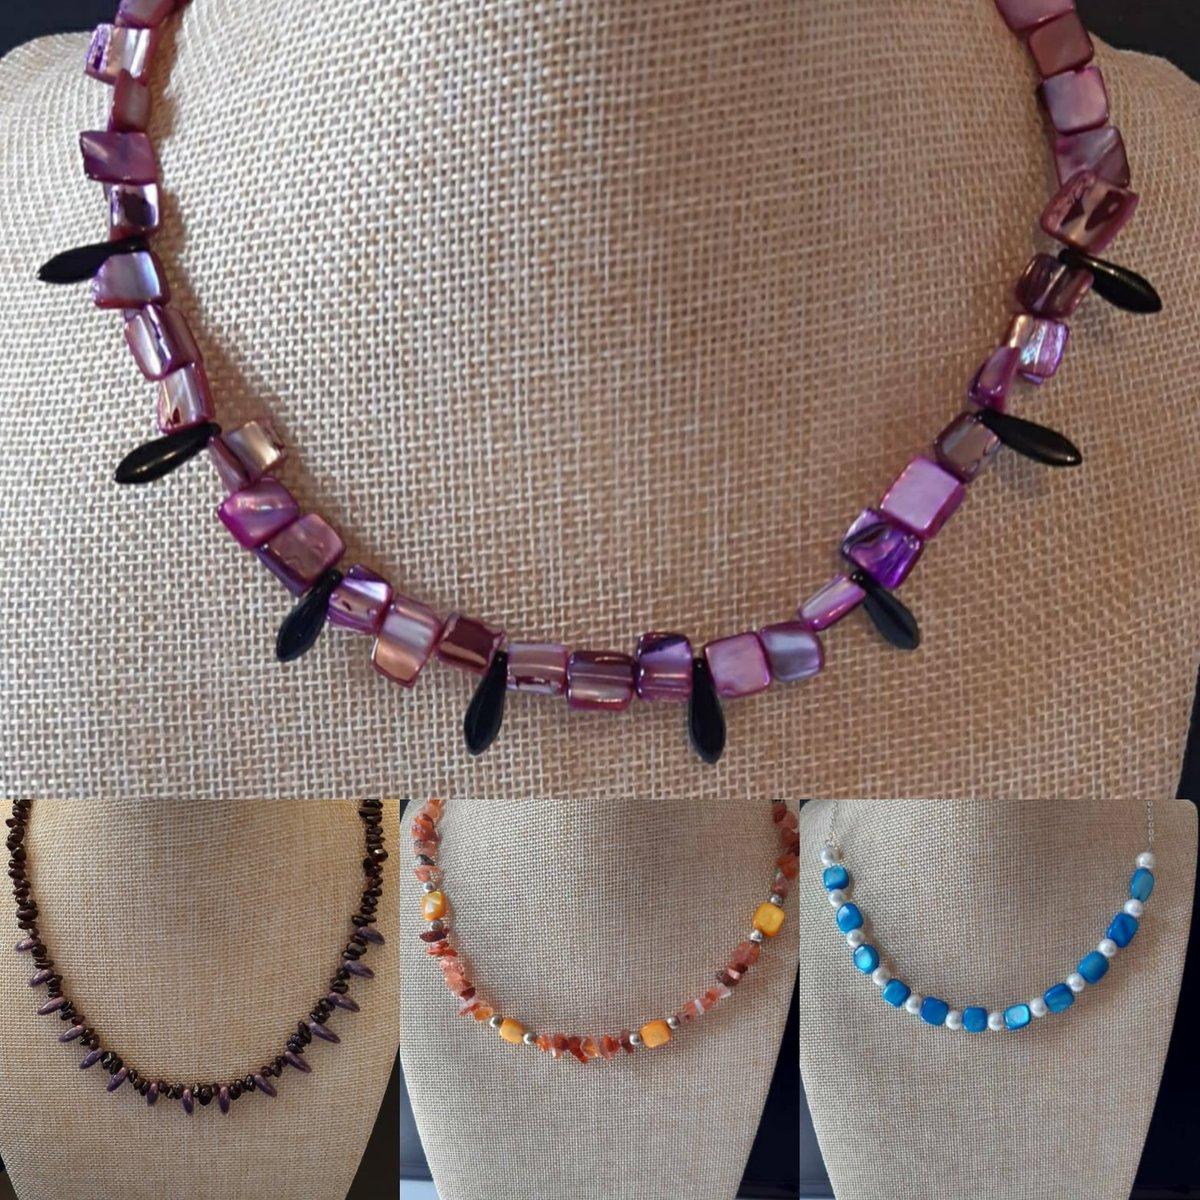 Necklaces available    #etsy #jewellery #handmadejewellery #jewellerydesign #jewelrysale #birthdaygift #giftideas #giftsforher #necklaces #jewelry  #SmallBusiness